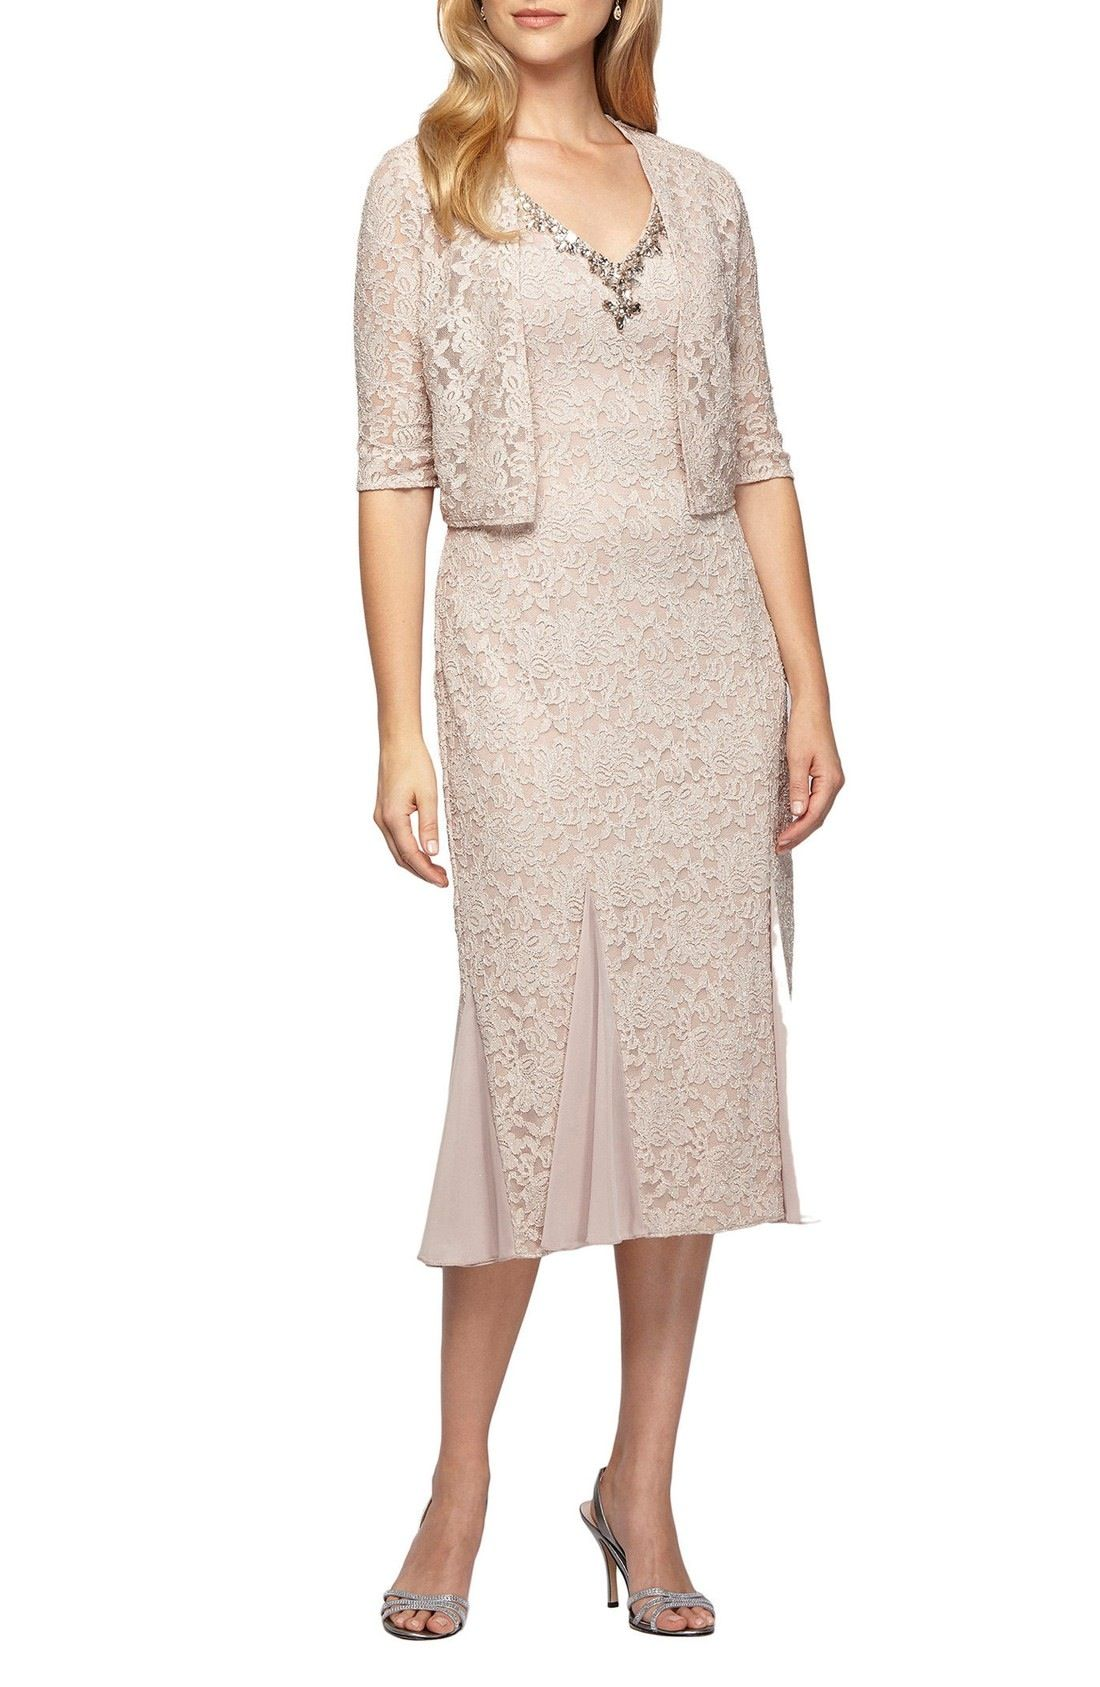 Nordstrom wedding dress  Alex Evenings Lace Tea Length Dress with Bolero Jacket available at